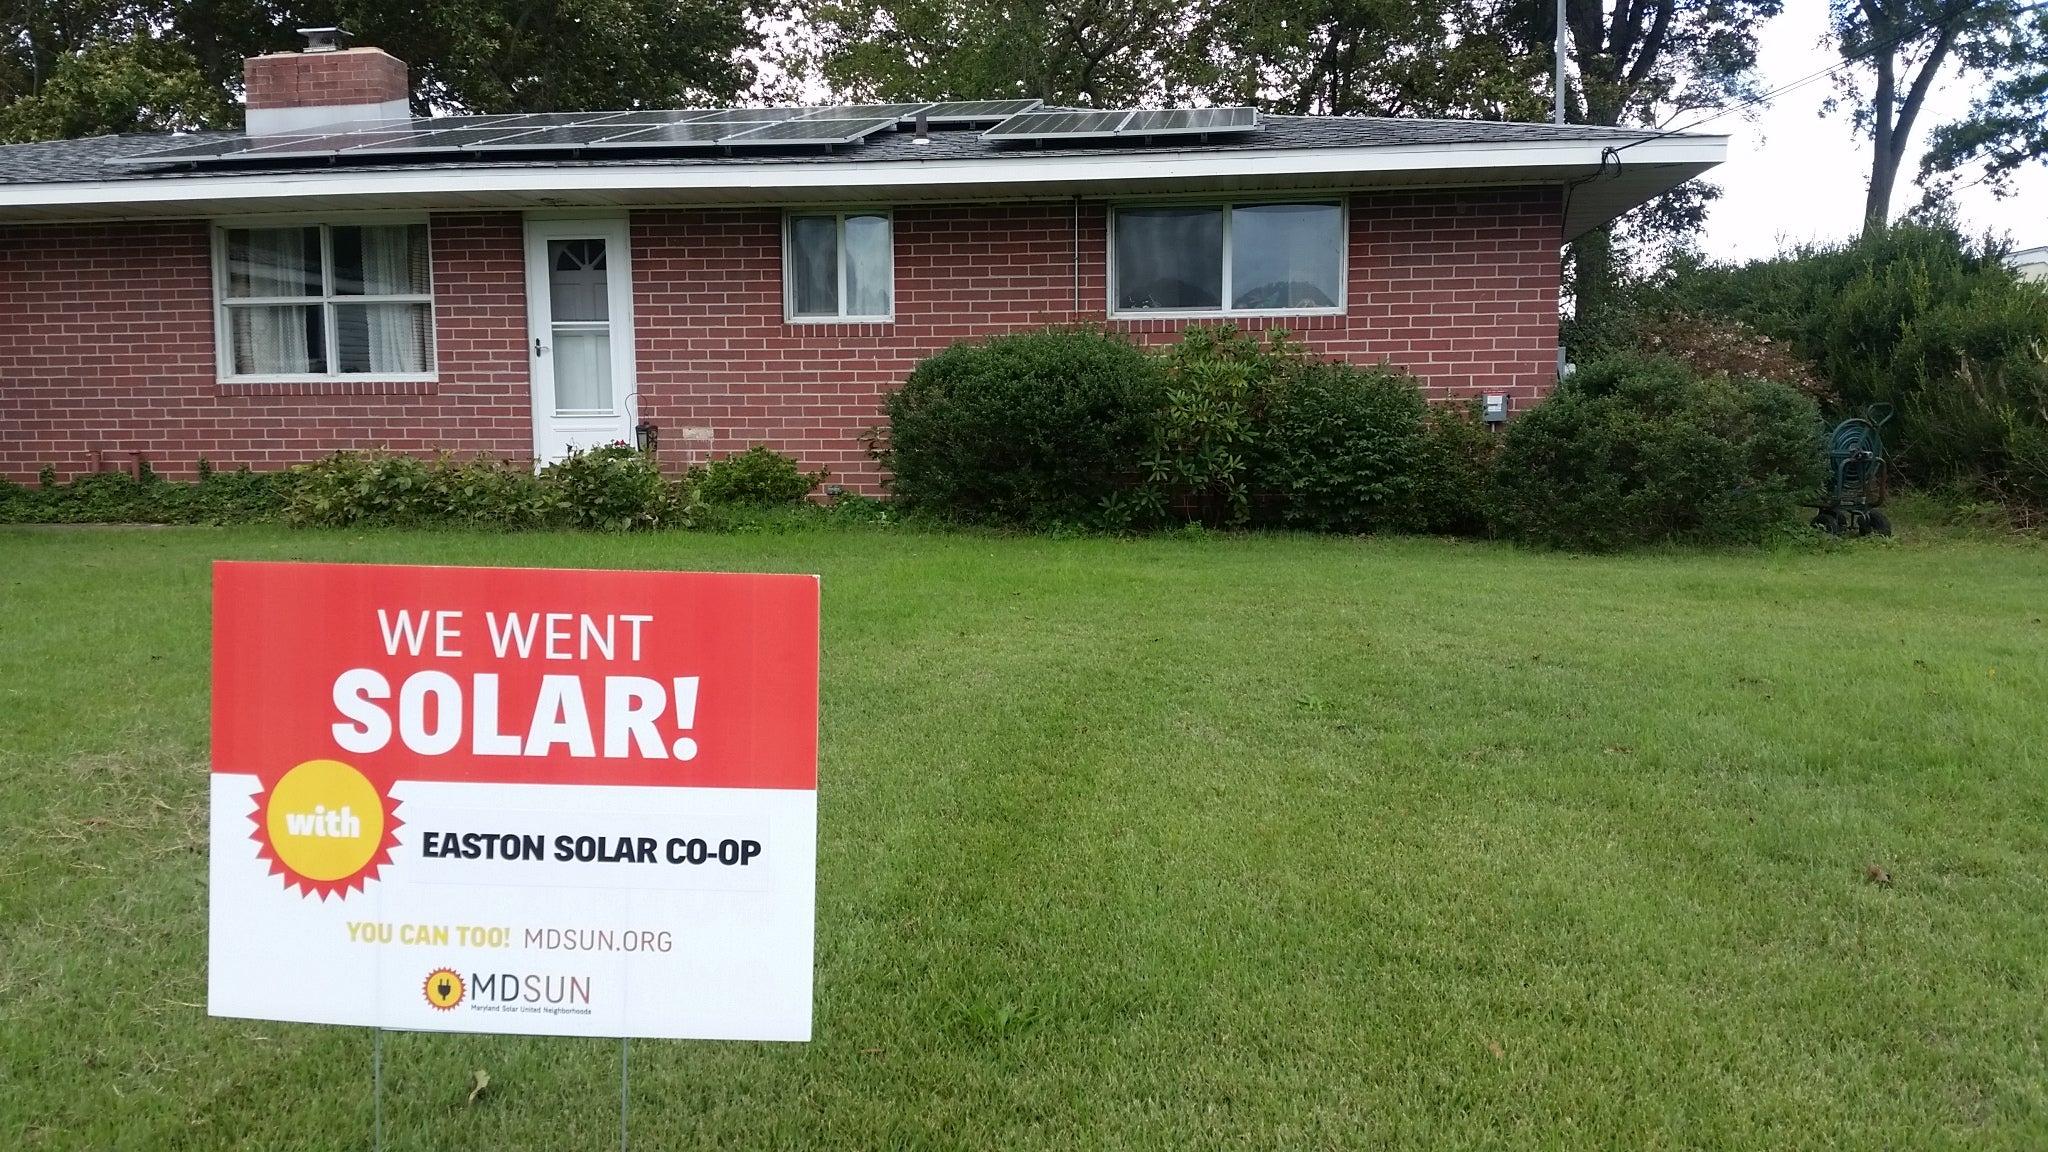 Rita Trice's solar installation